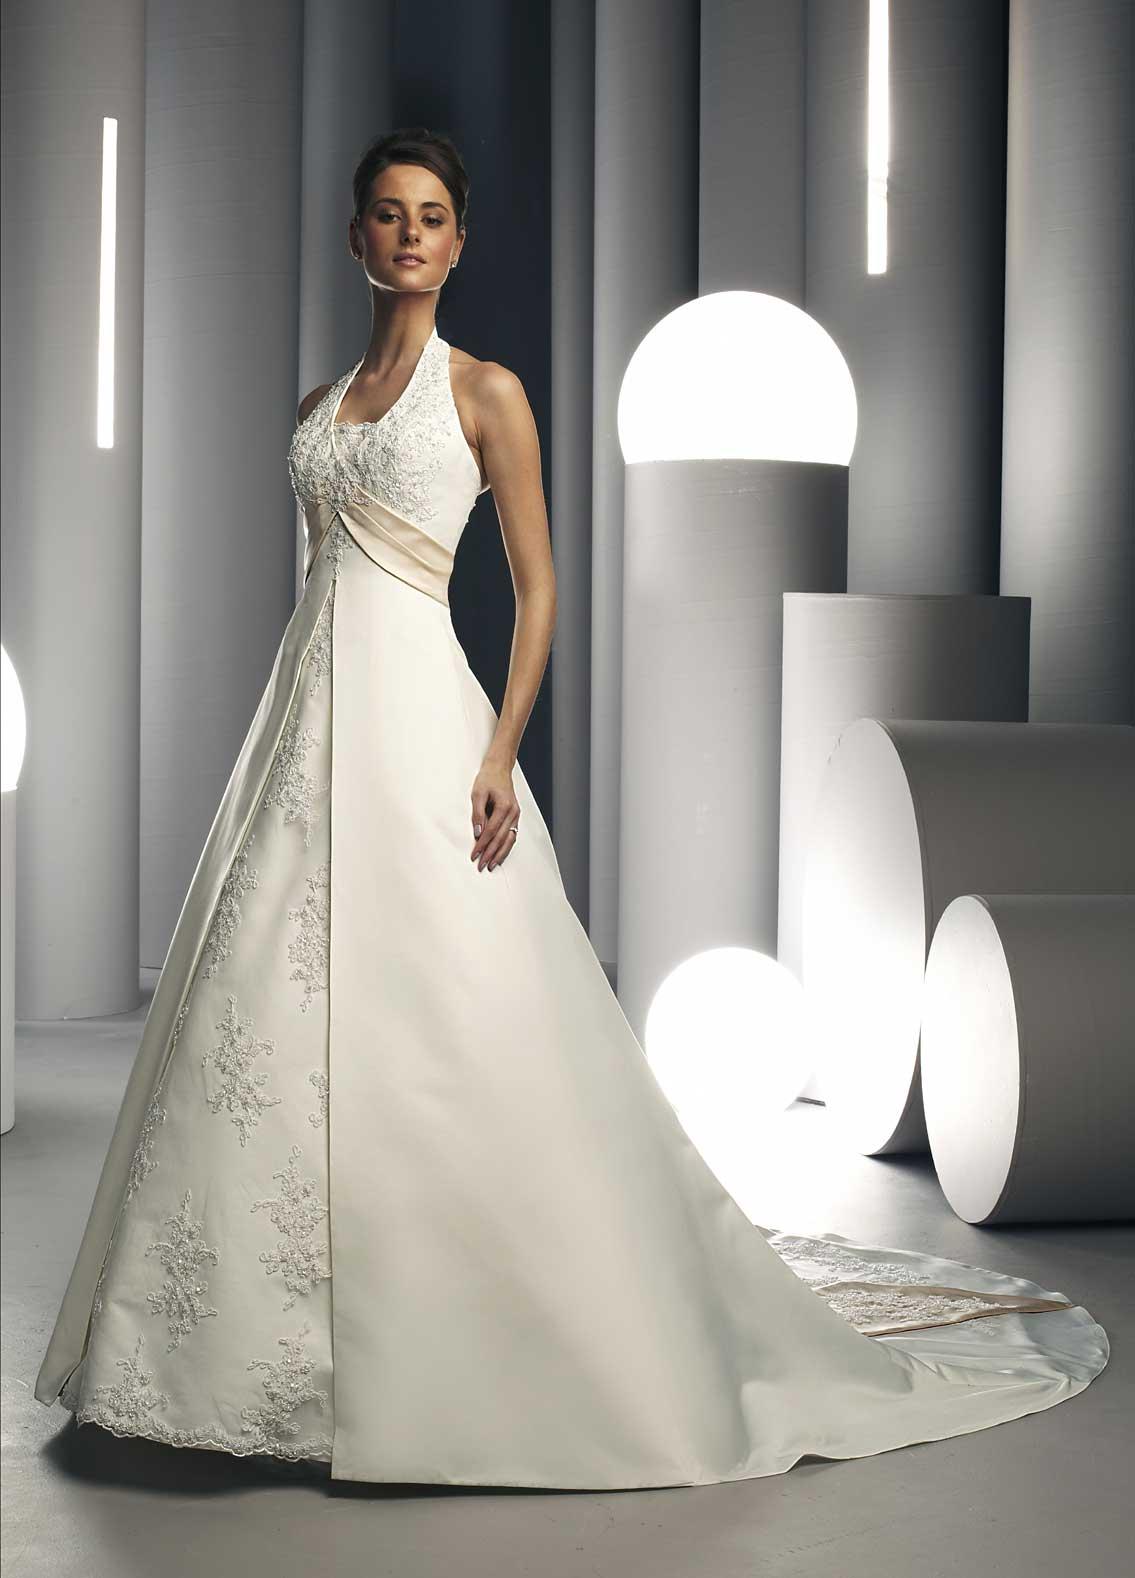 Fashion Focus: Halter Wedding Dress Collection